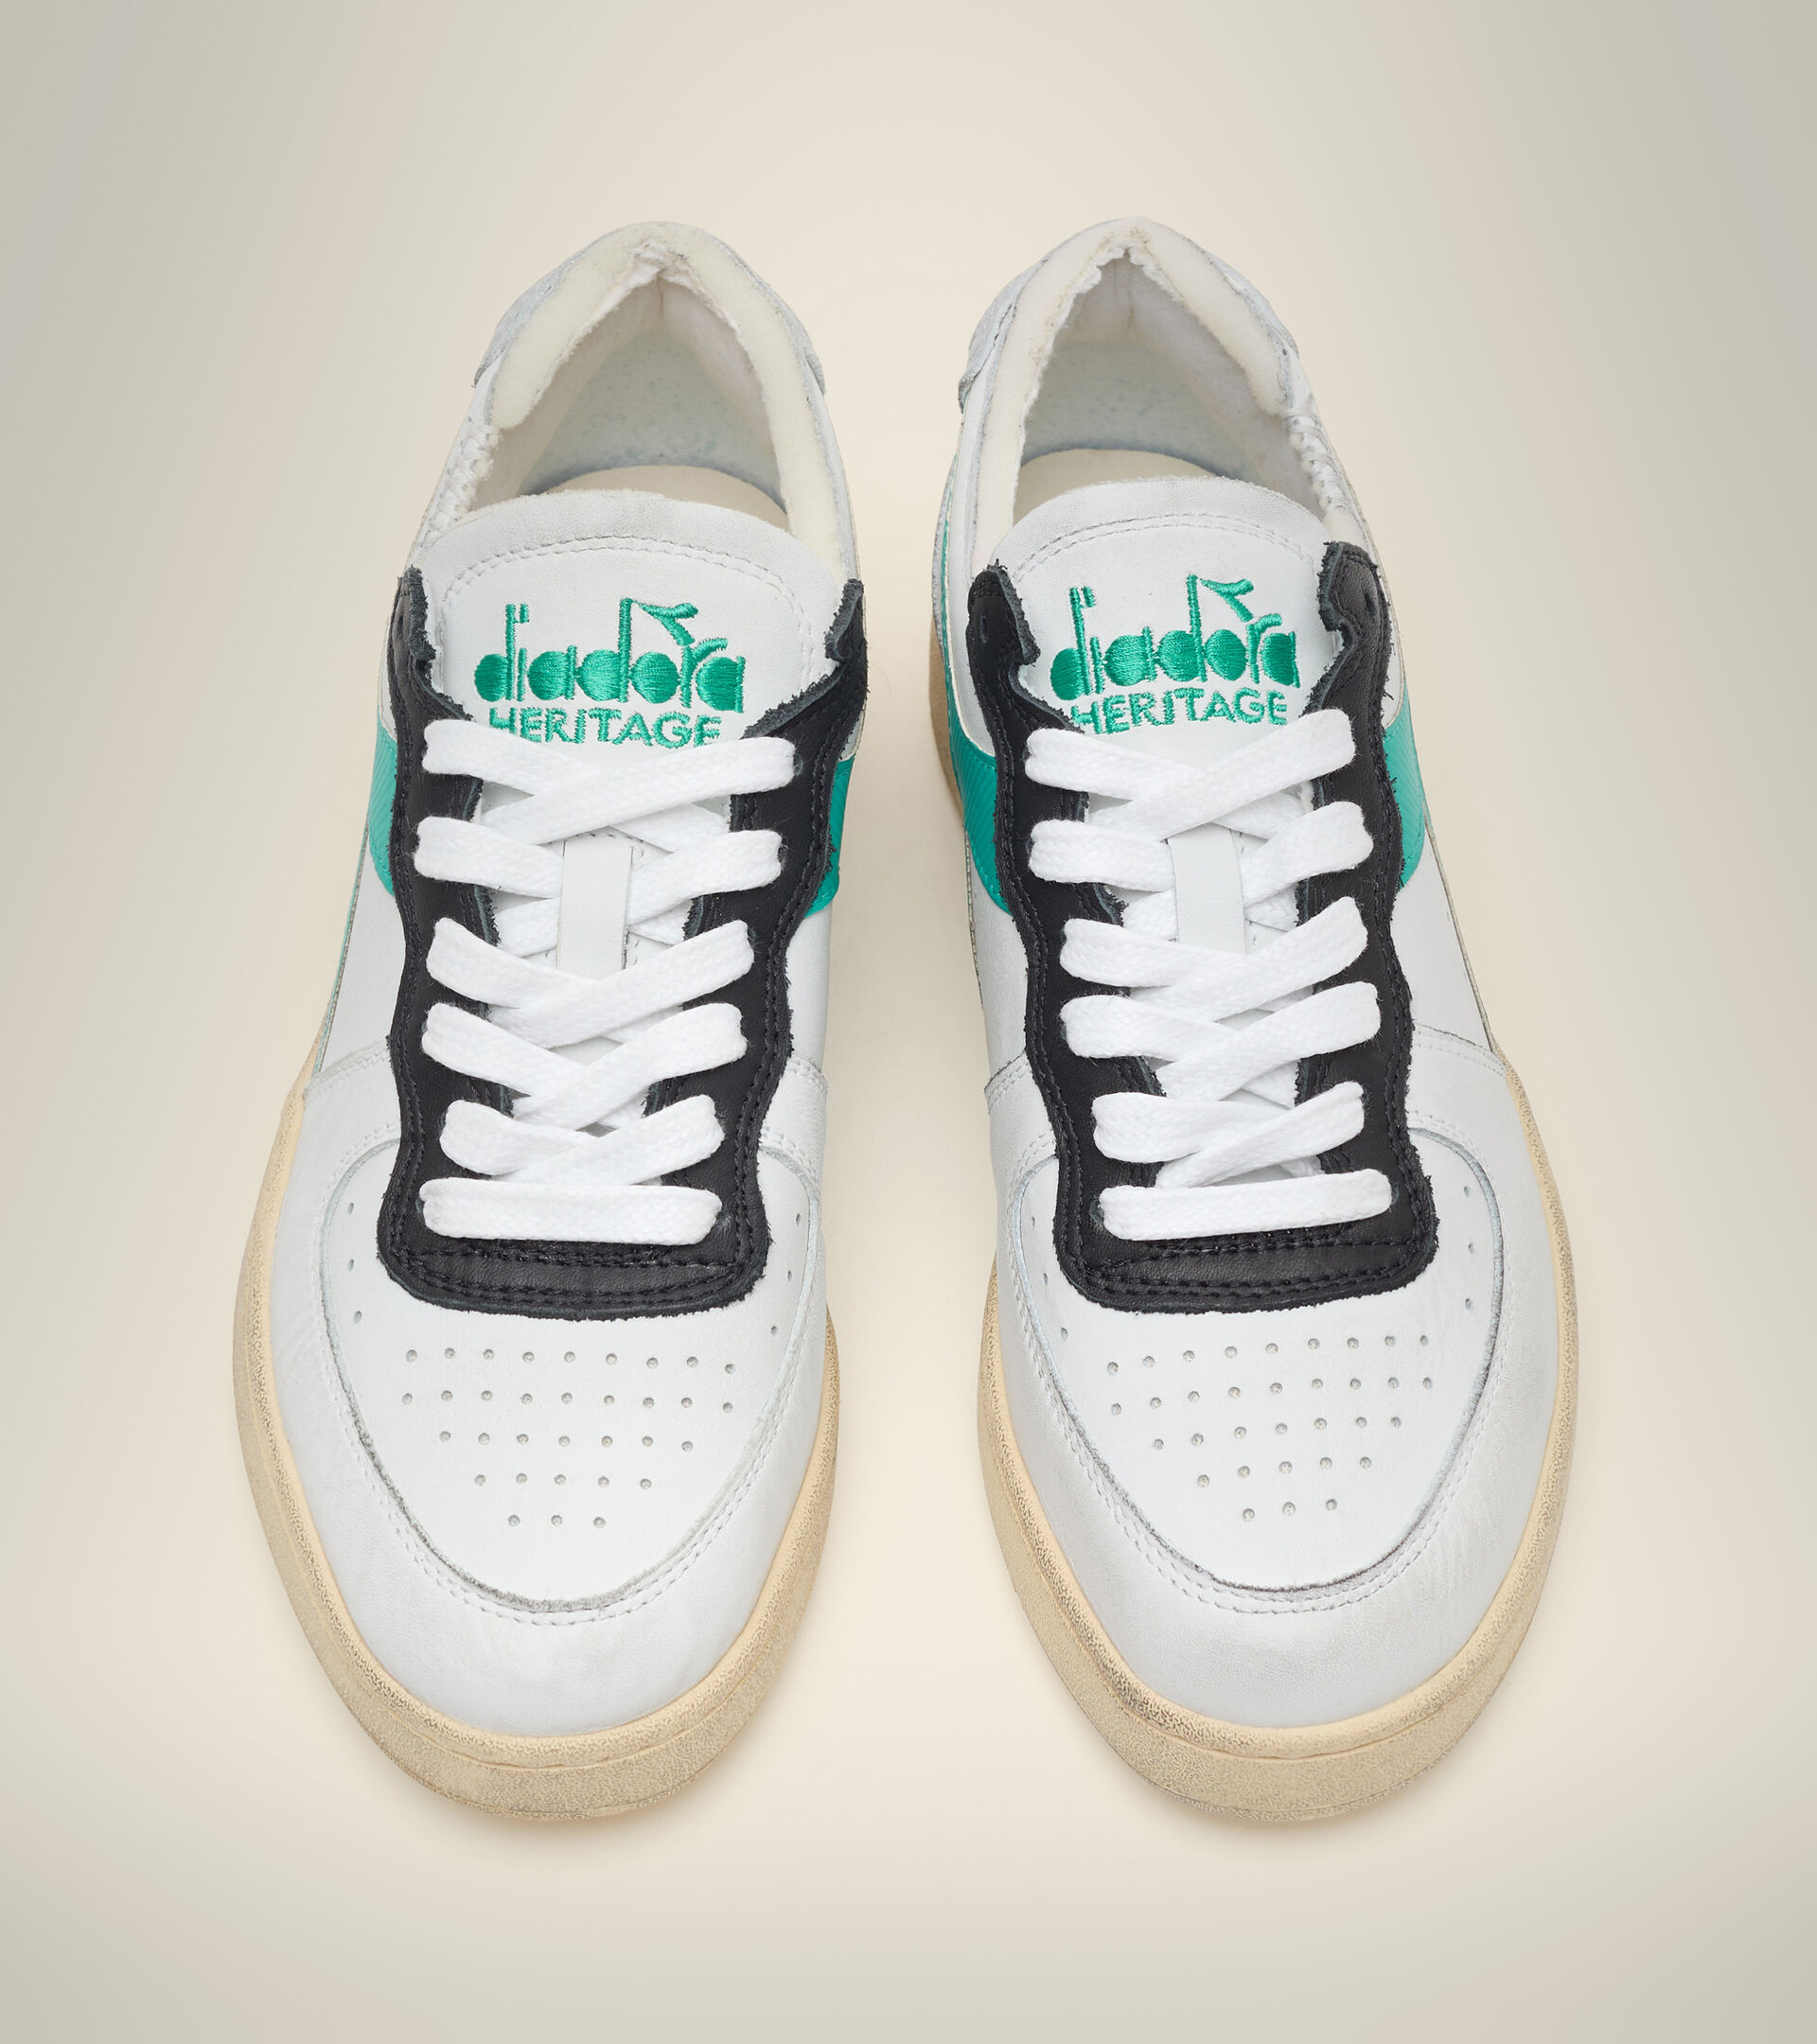 Heritage-Schuh - Unisex MI BASKET ROW CUT WSS/HOCHHAUS/PFAU GRUEN - Diadora